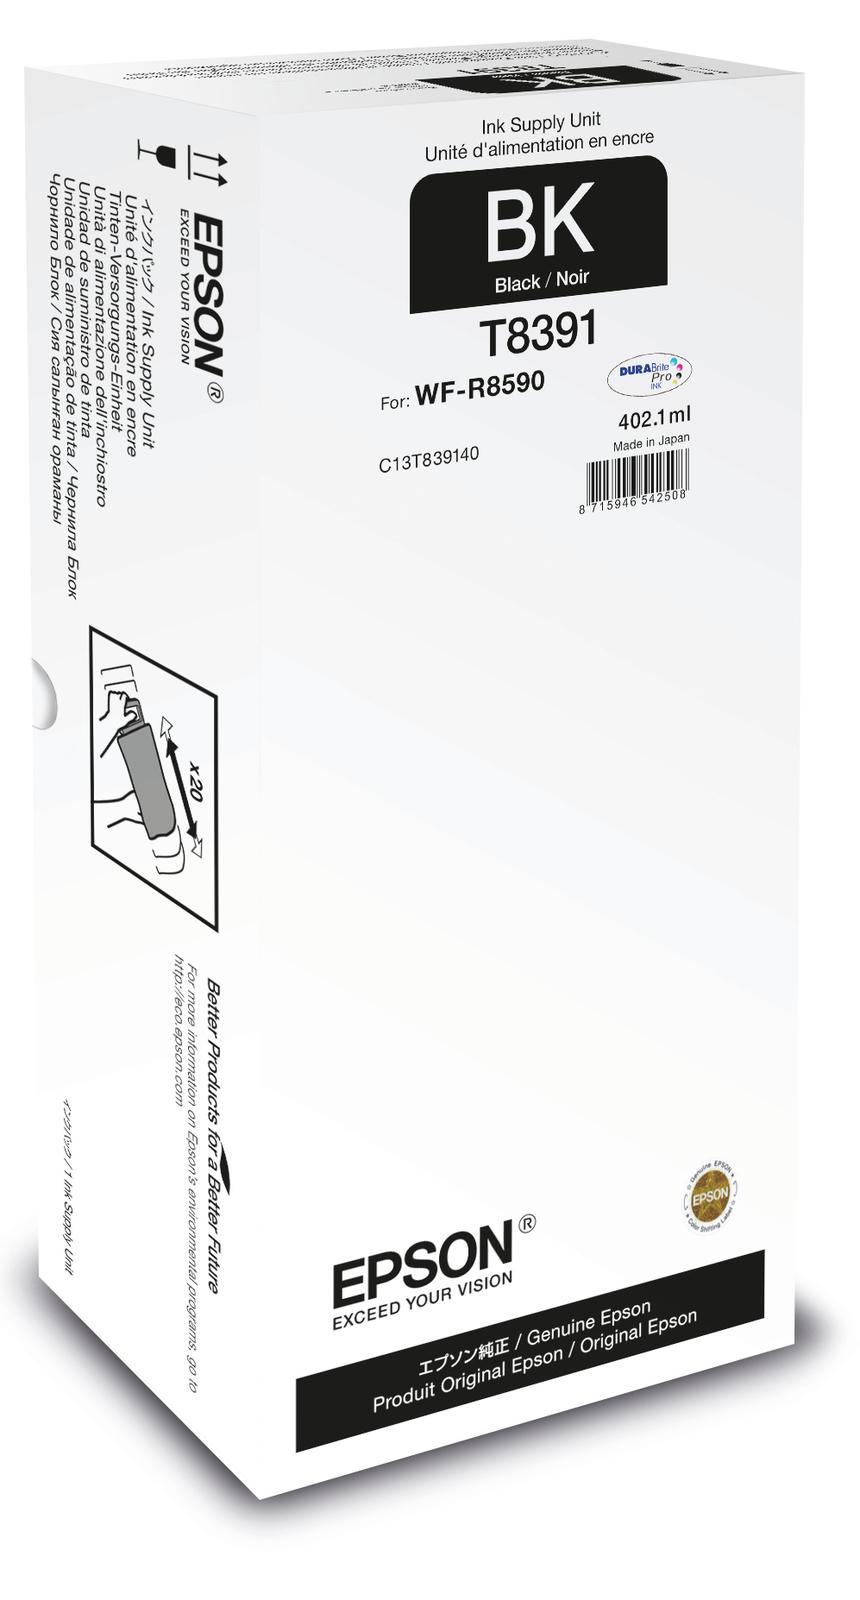 Epson C13T839140 (T8391) Ink cartridge black, 20K pages, 402ml - $262.80